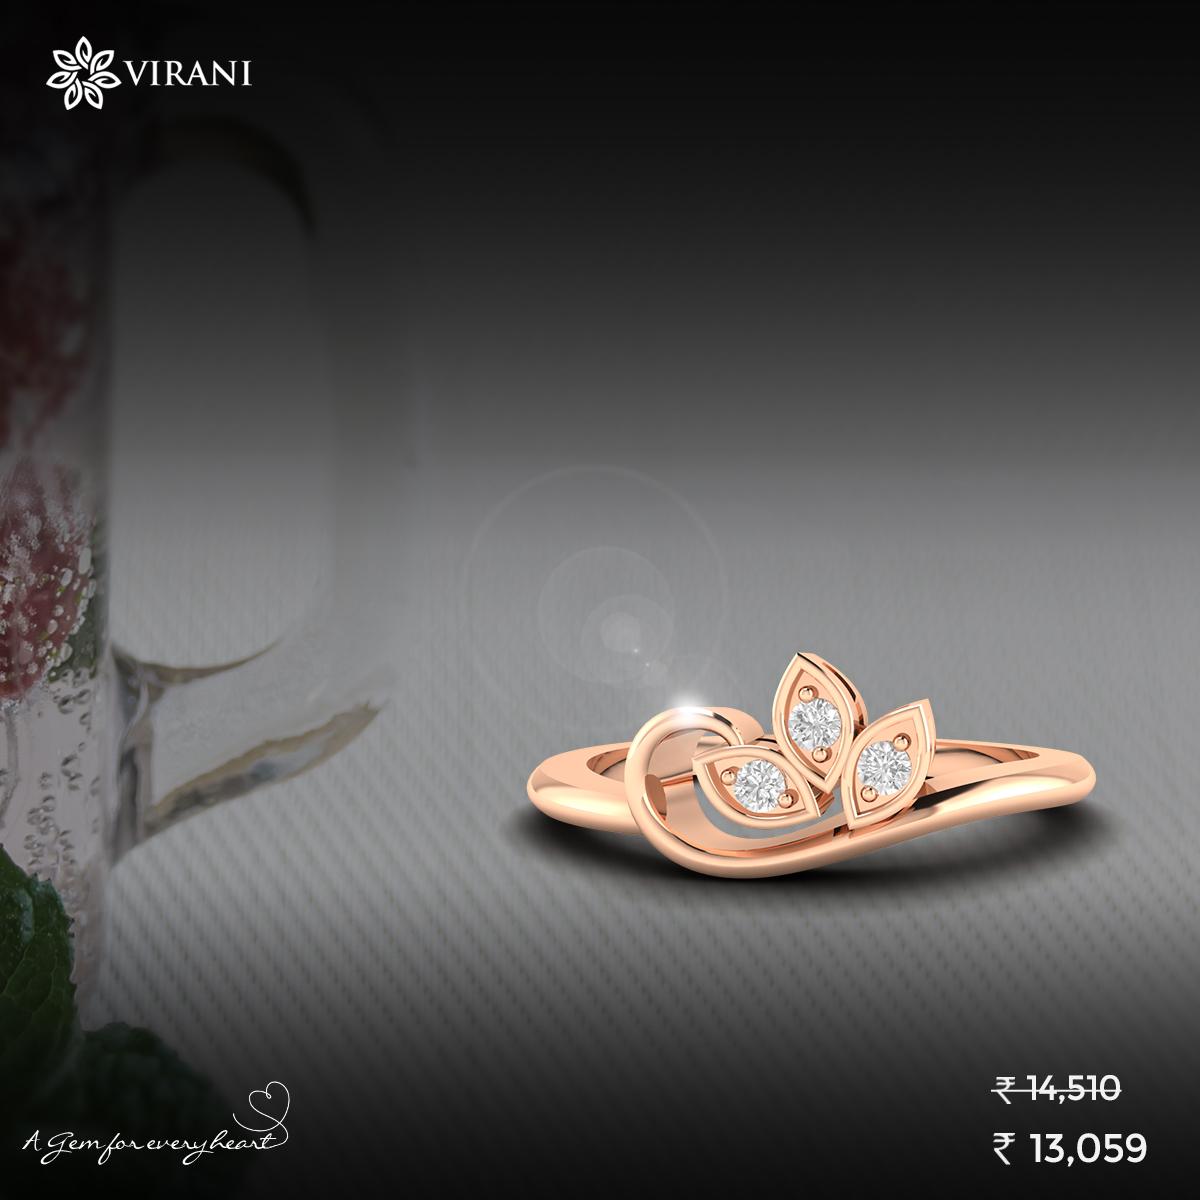 Viranigems - Diamond Jewellery Online